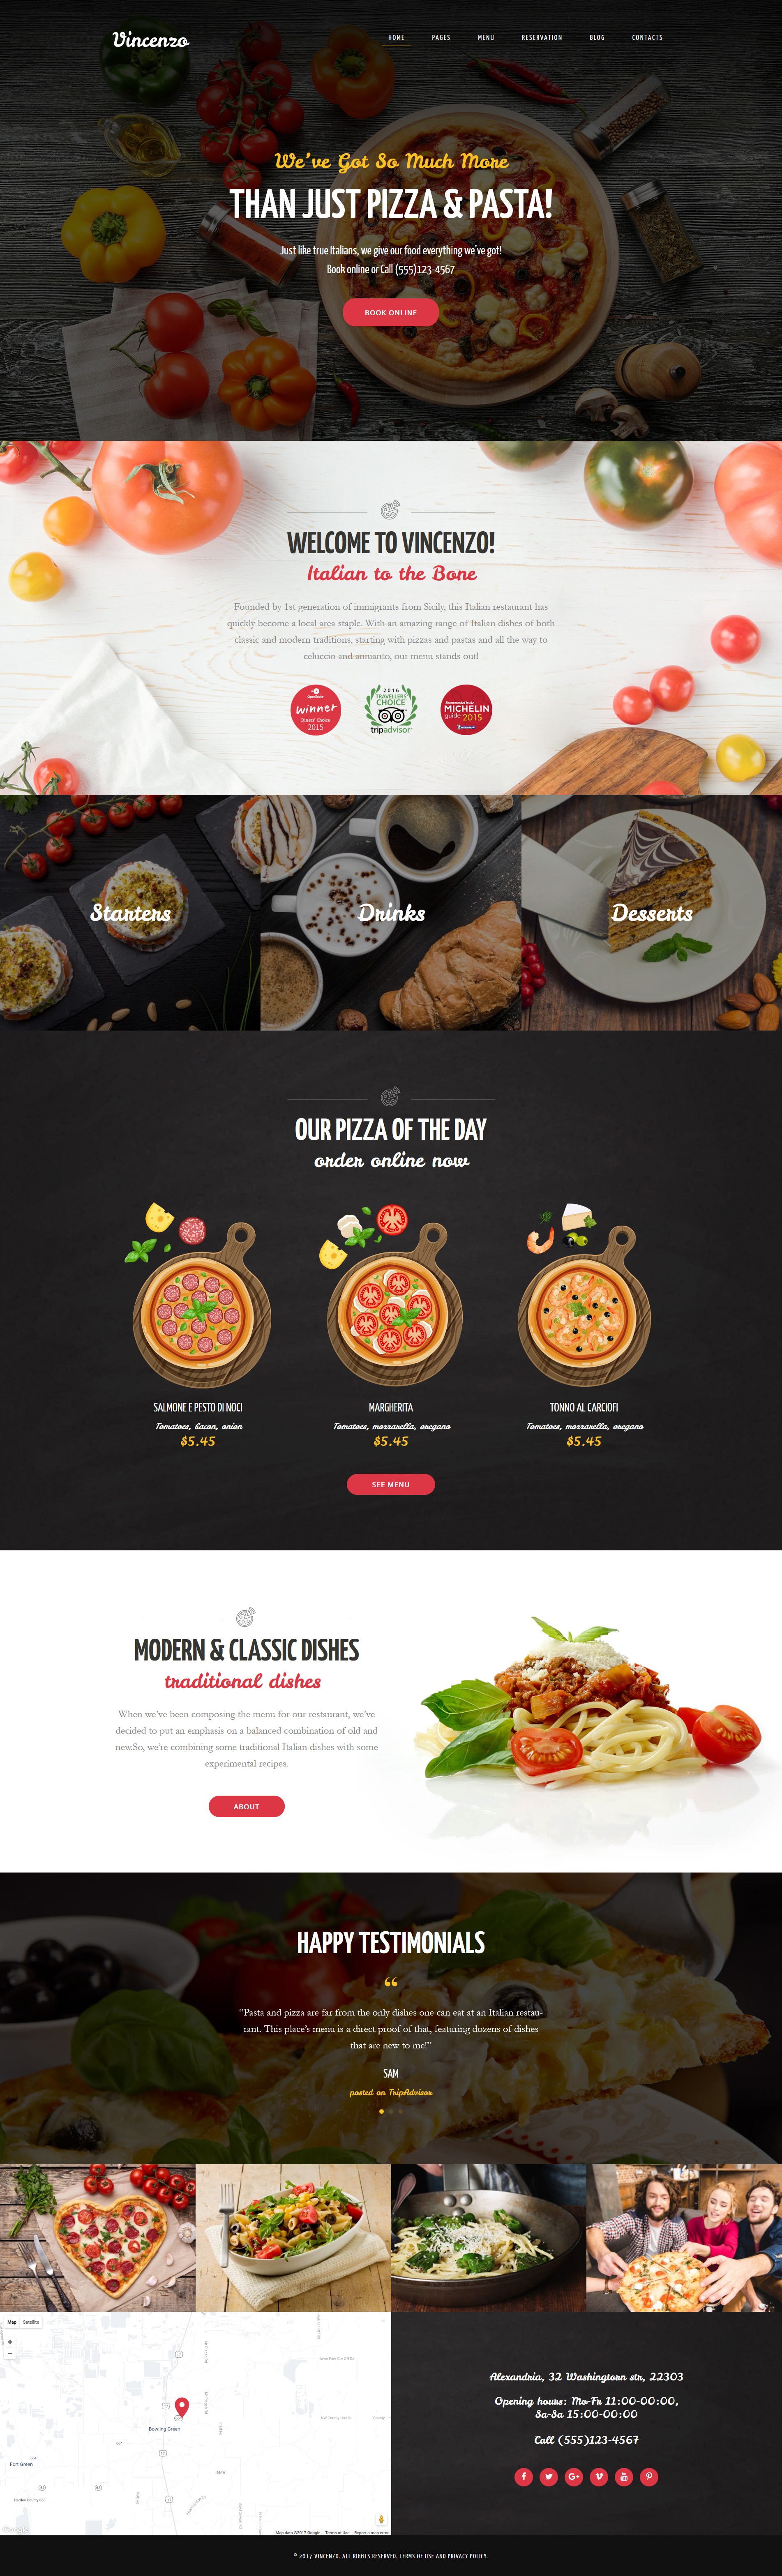 Vincenzo - Delicious Pizza Restaurant Responsive WordPress Theme